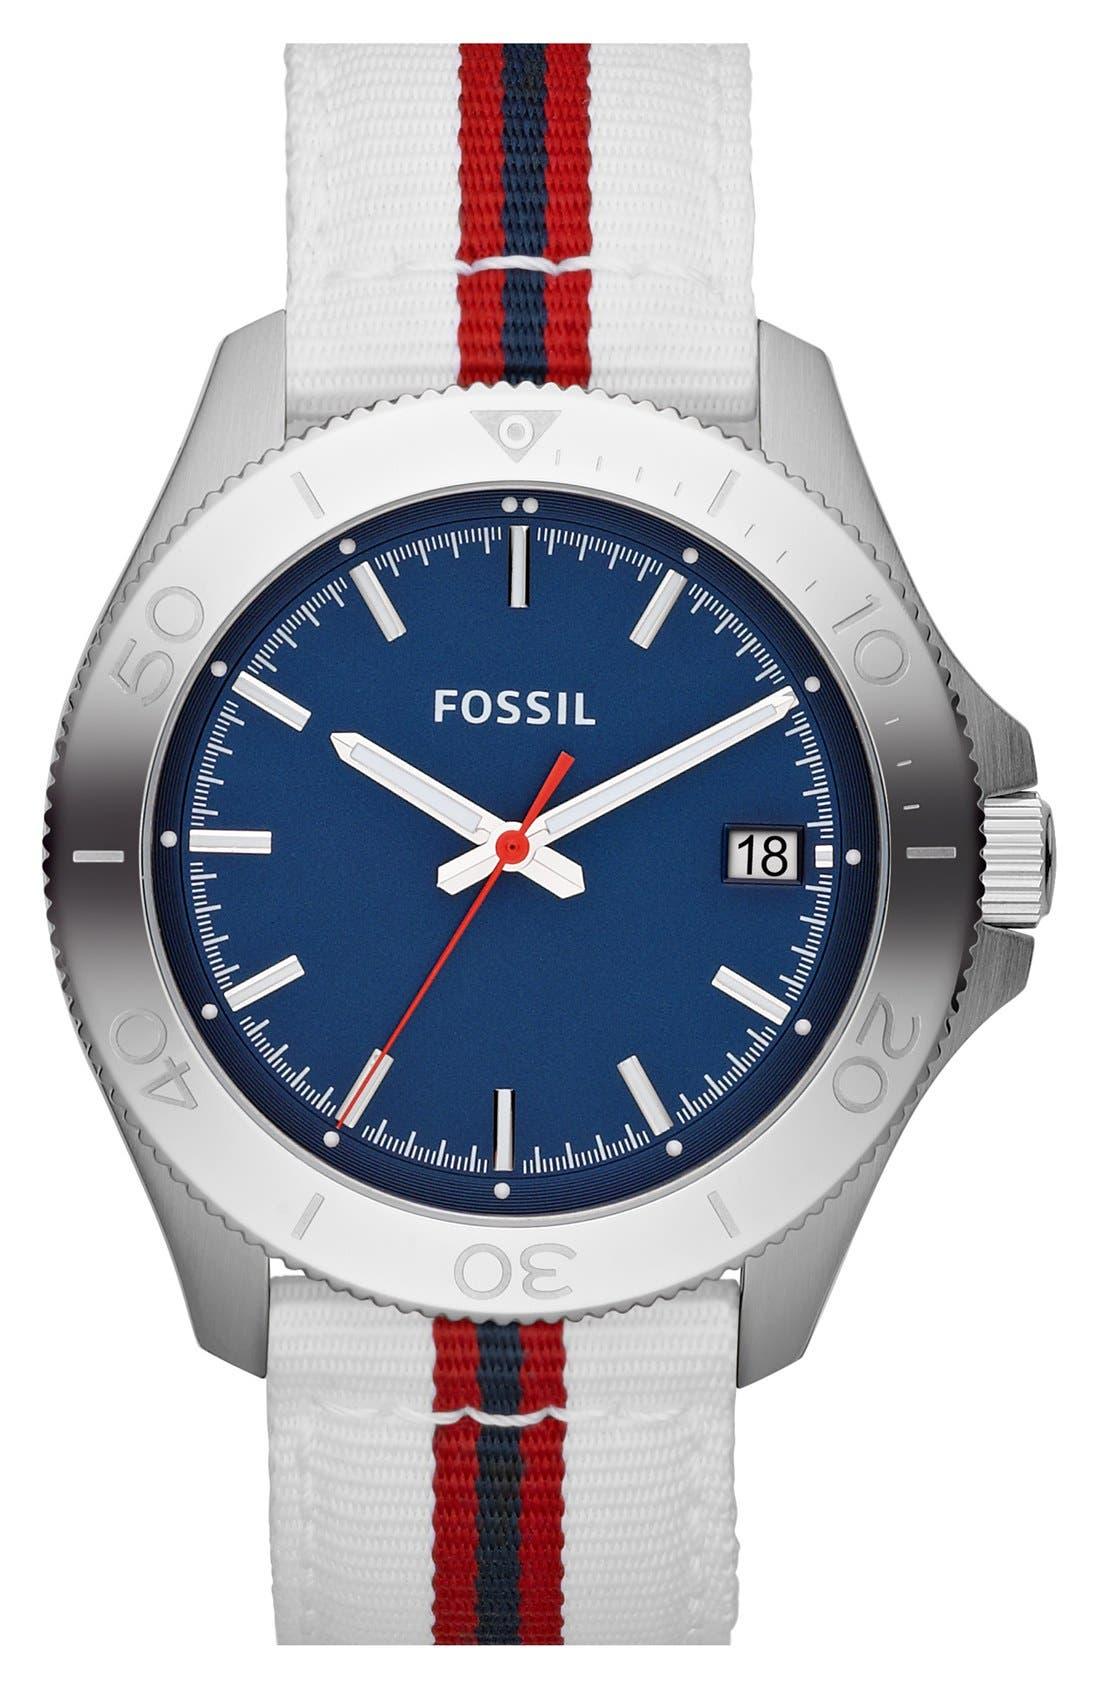 FOSSIL, 'Retro Traveler' Nylon Strap Watch, 44mm, Main thumbnail 1, color, 100